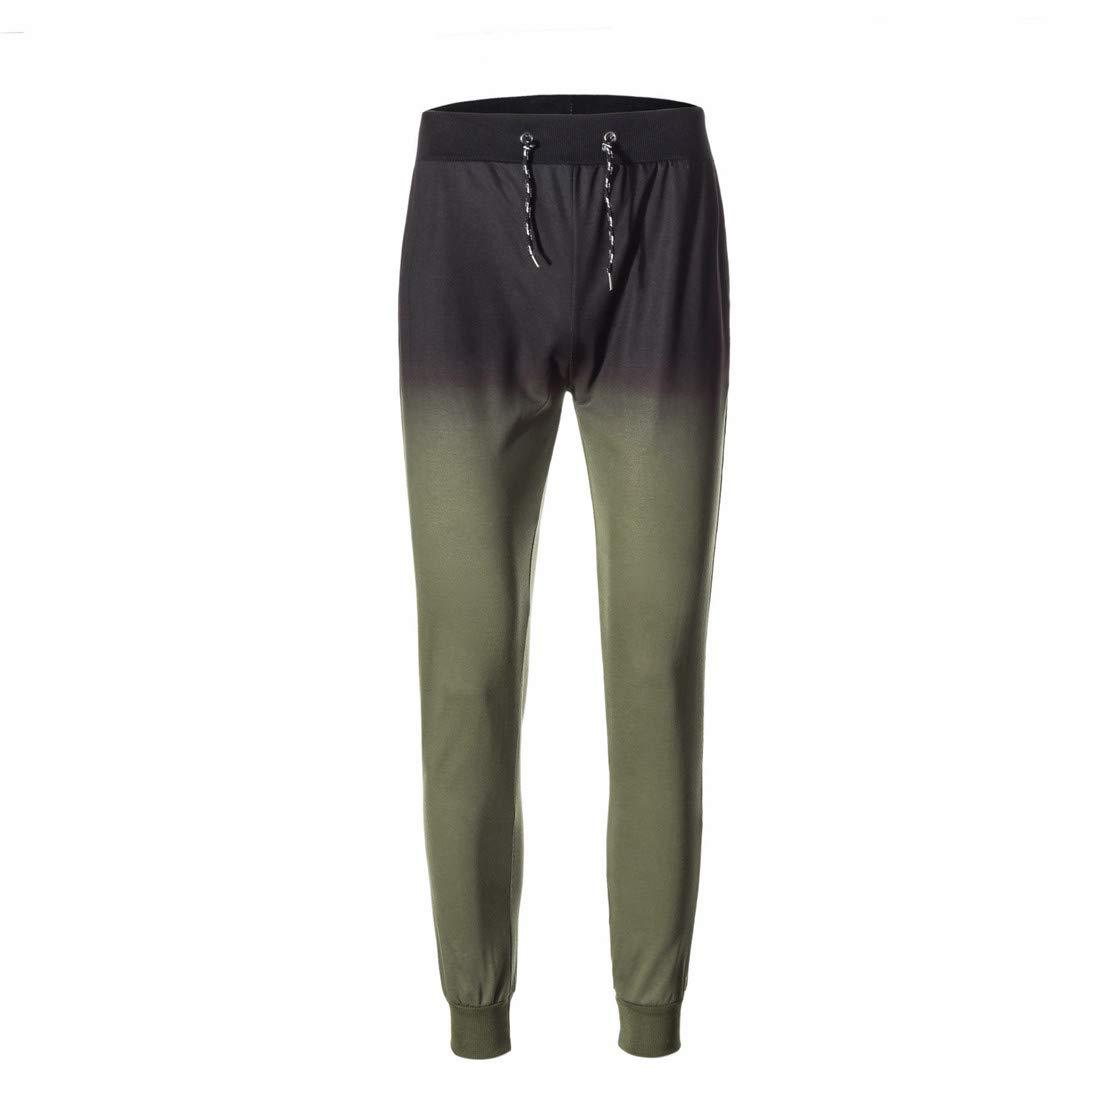 Mikey Store Mens Fashion Stripe Gradient Sweatshirt Top Pants Sets